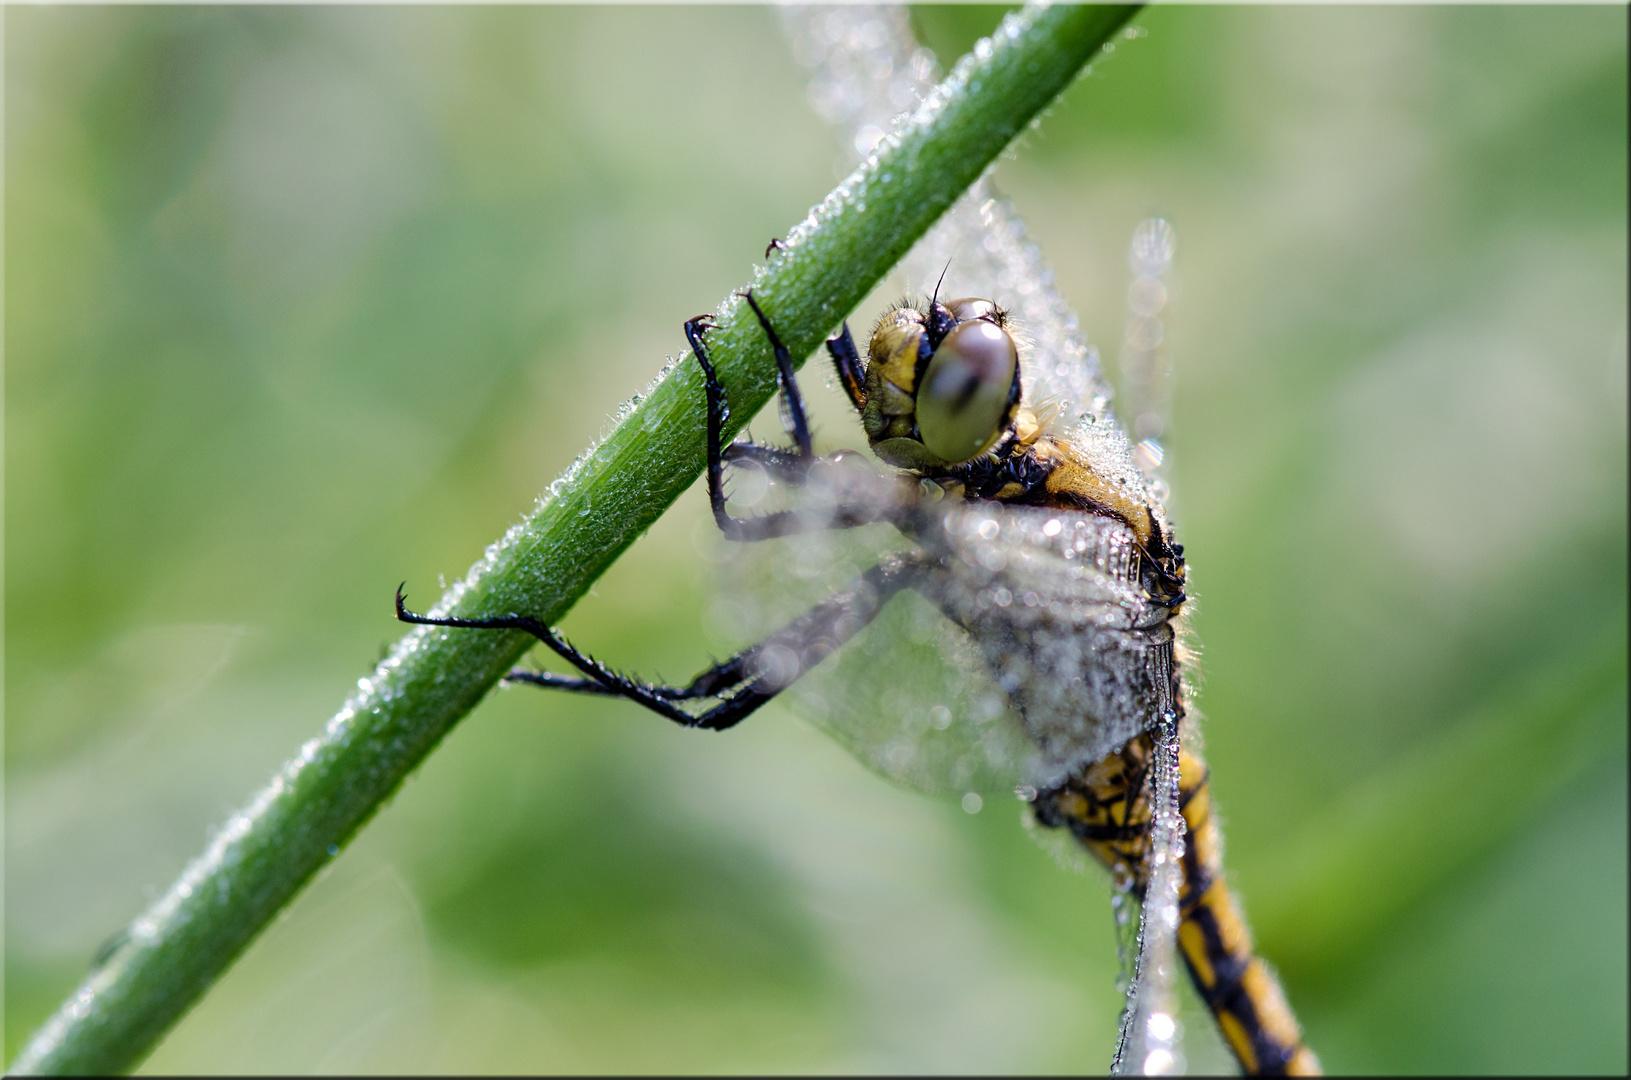 Libelle (großer Blaupfeil)